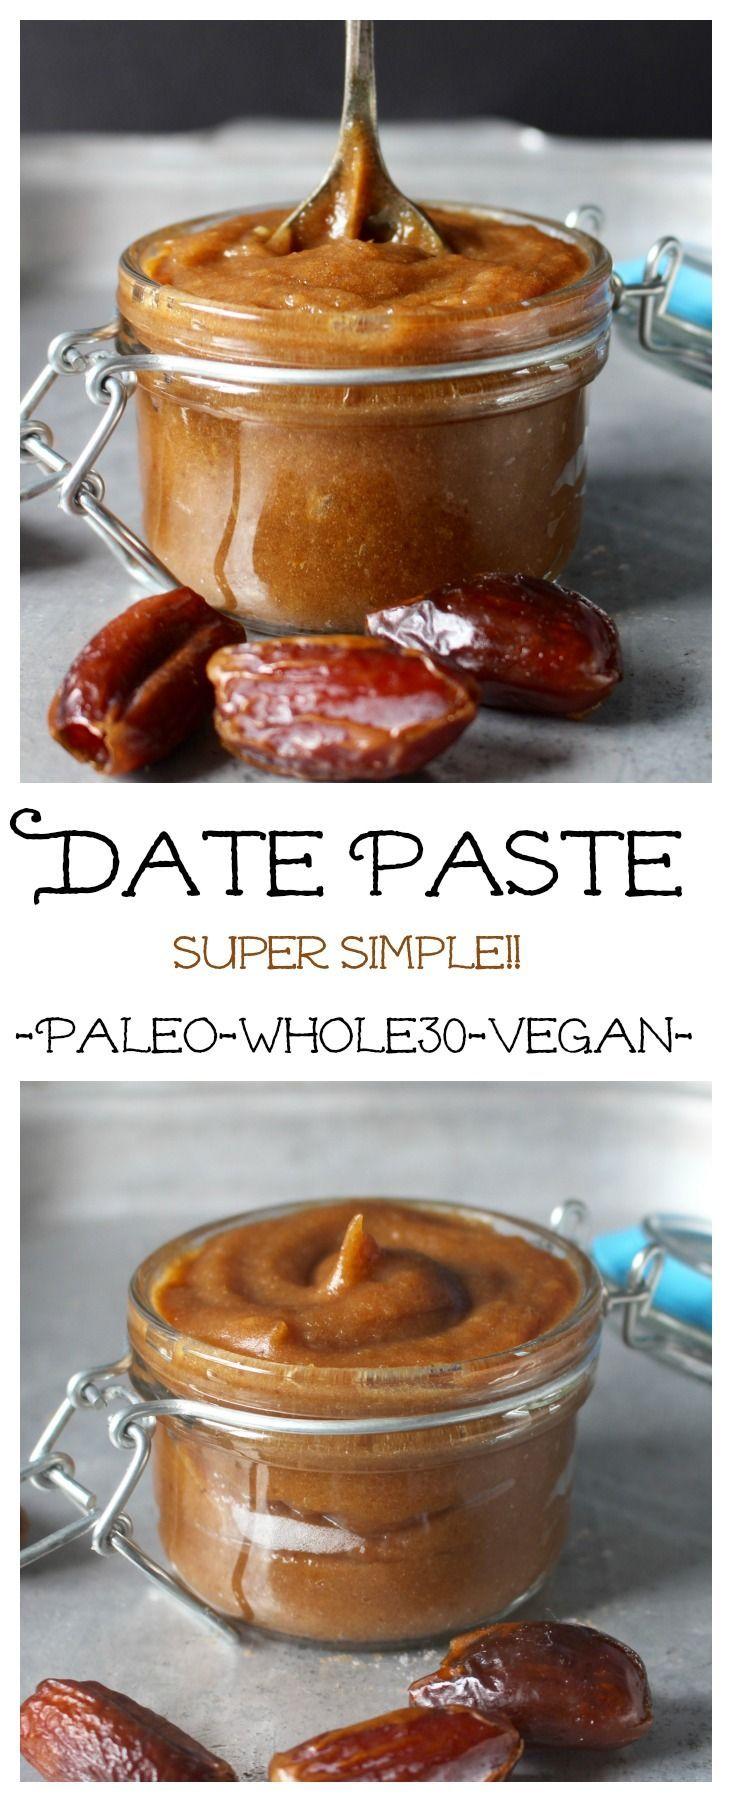 Date Paste Paleo Whole30 Vegan